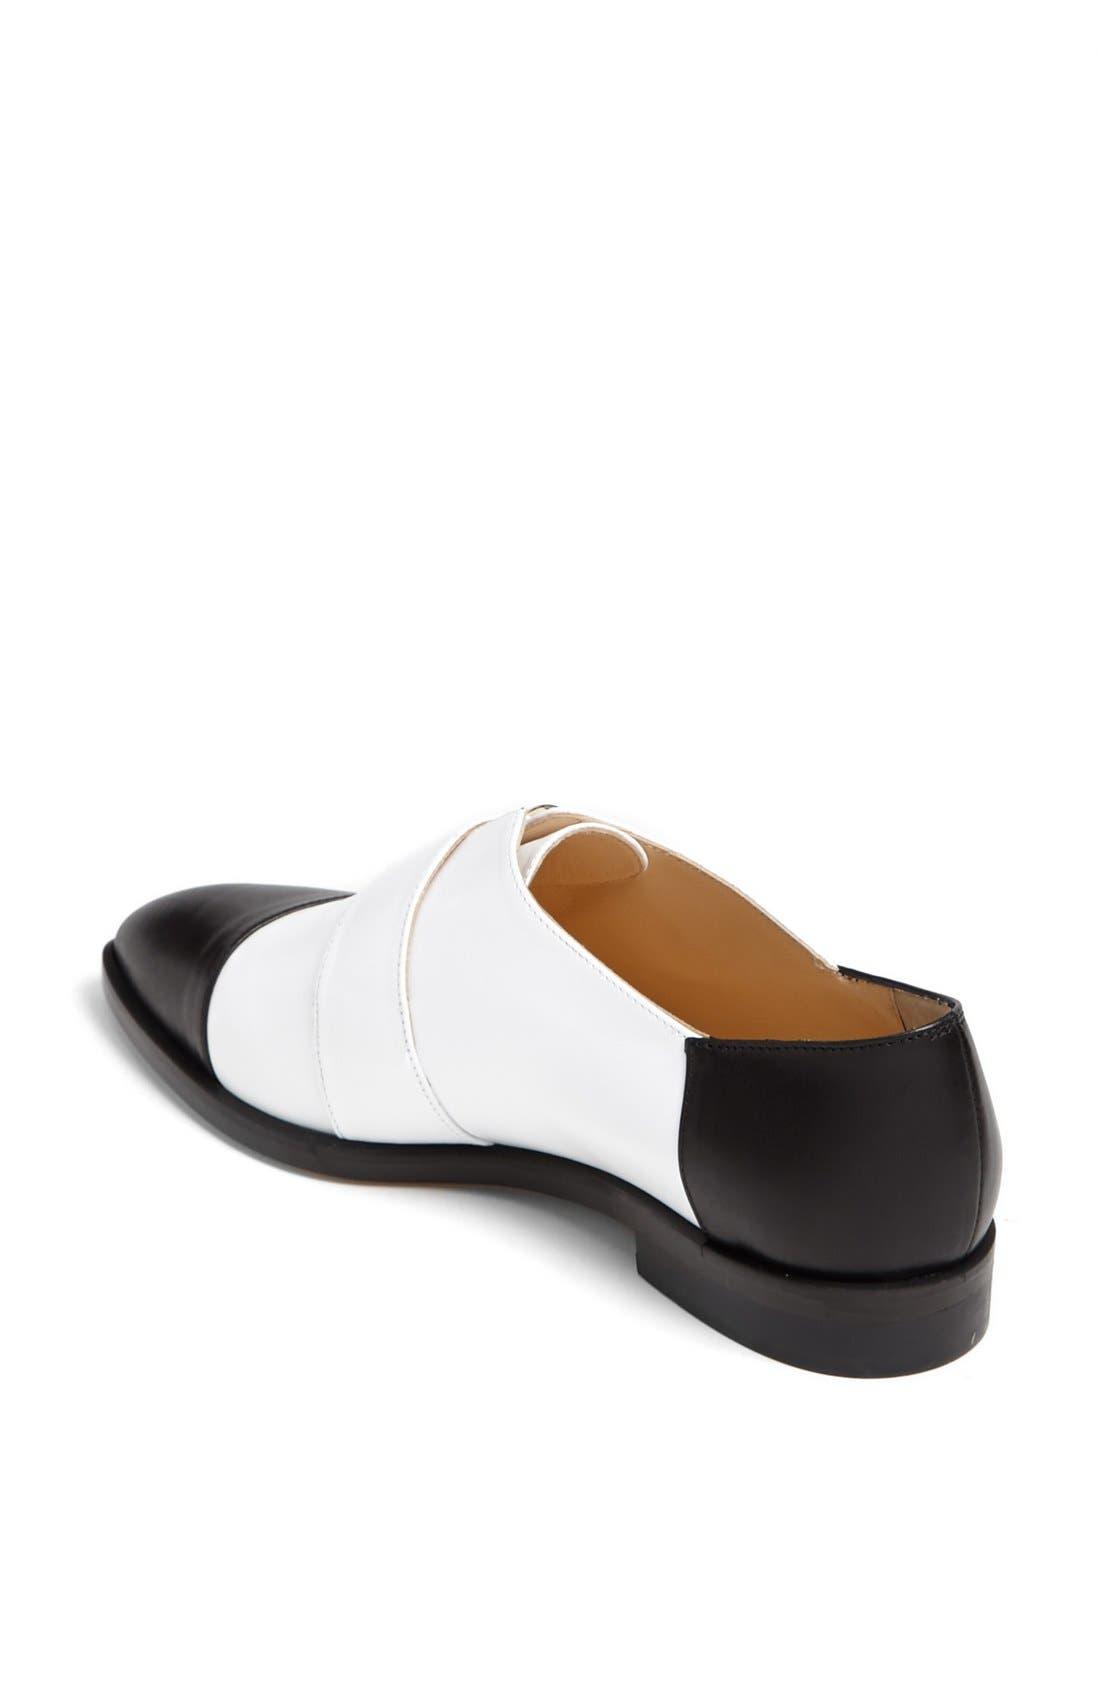 Alternate Image 2  - Bionda Castana 'Norma' Brogue Shoe